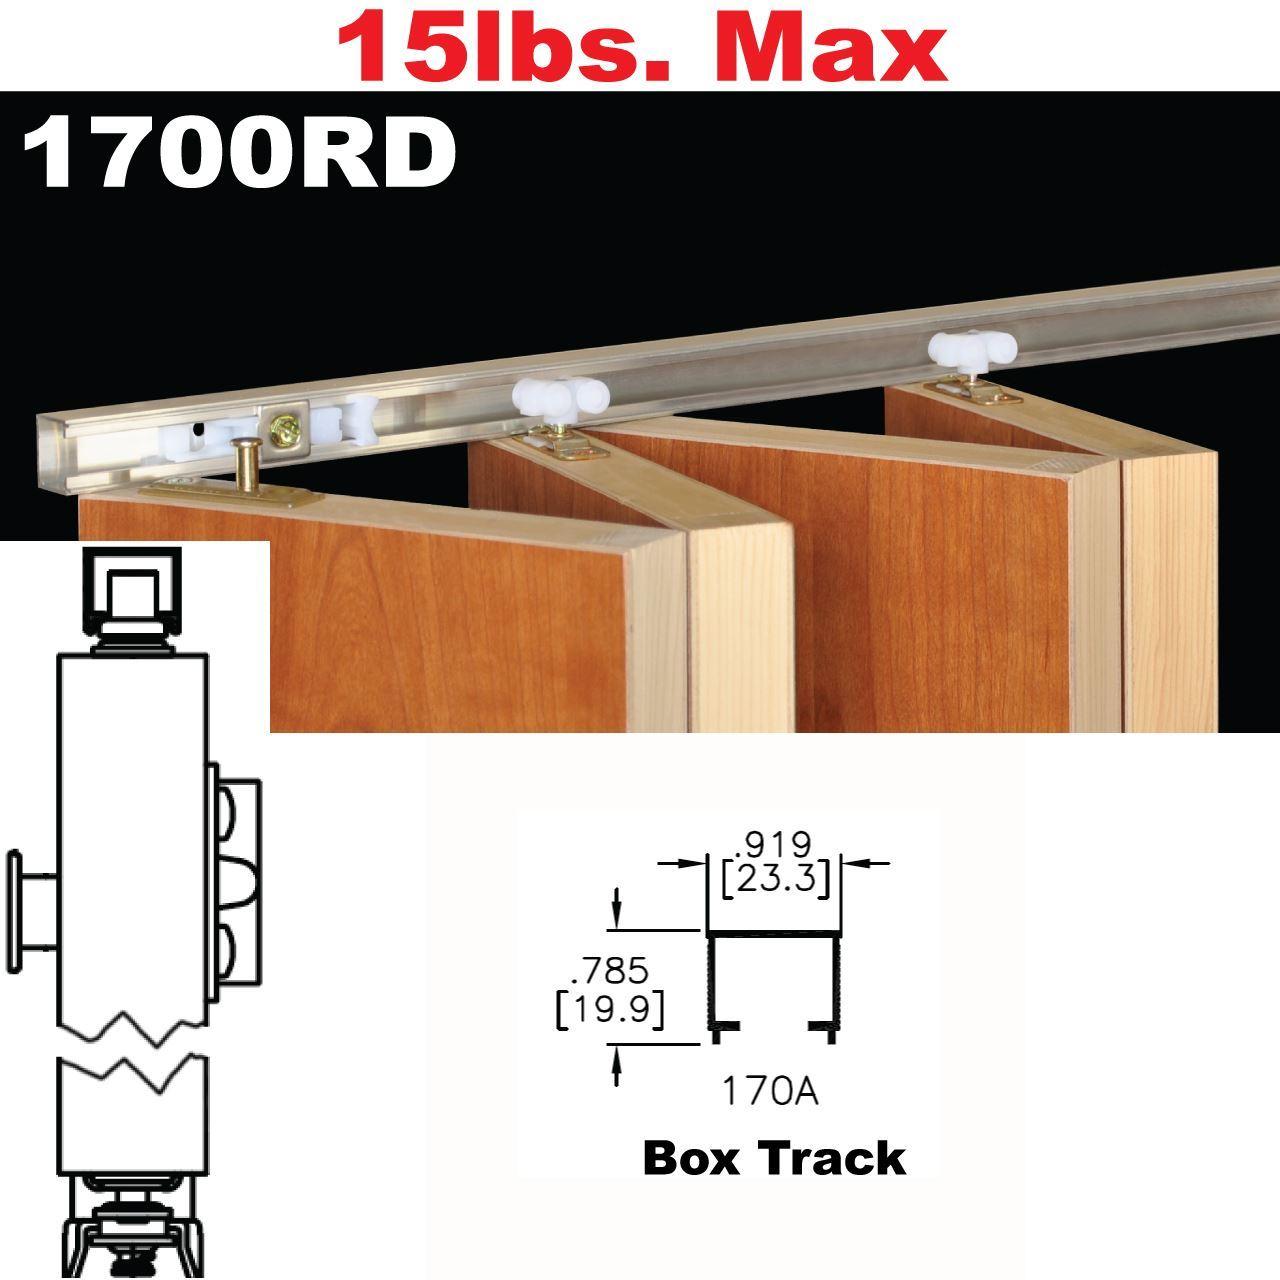 Johnson Hardware 1700rd Multi Fold Door Hardware